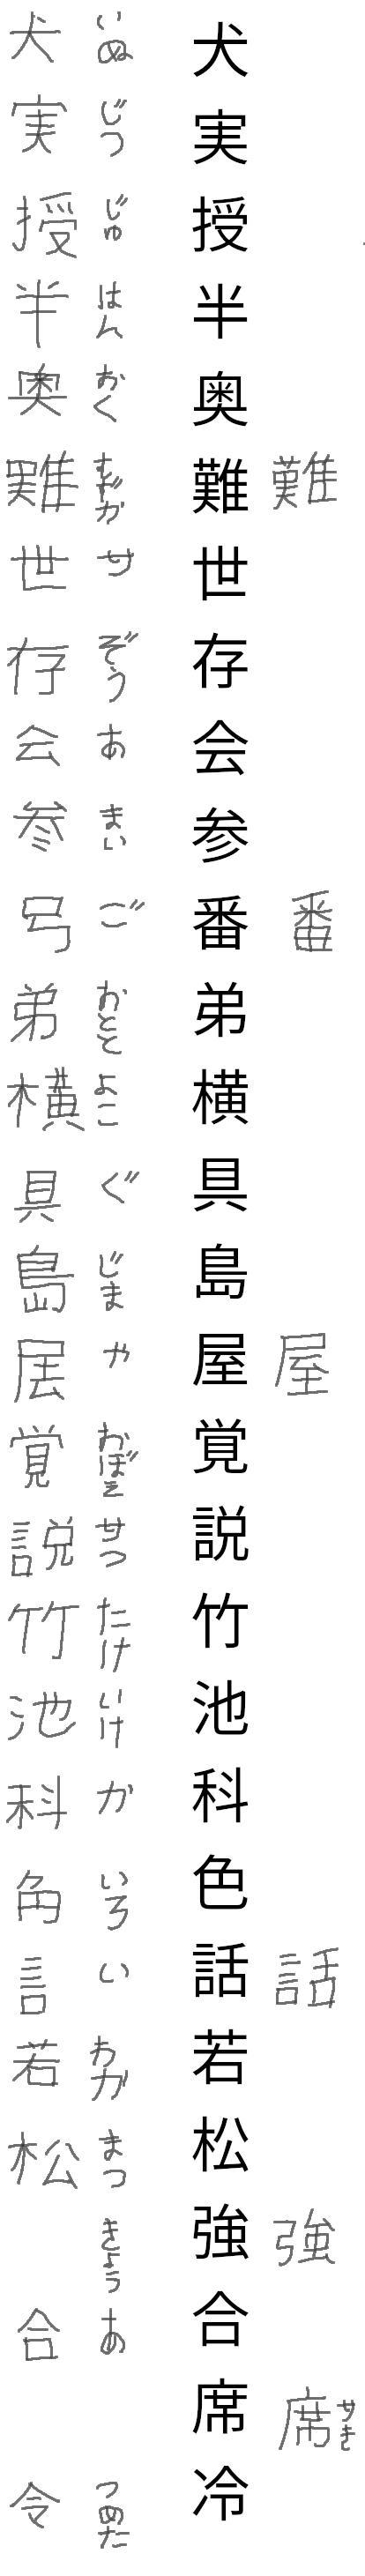 kanji test row 16